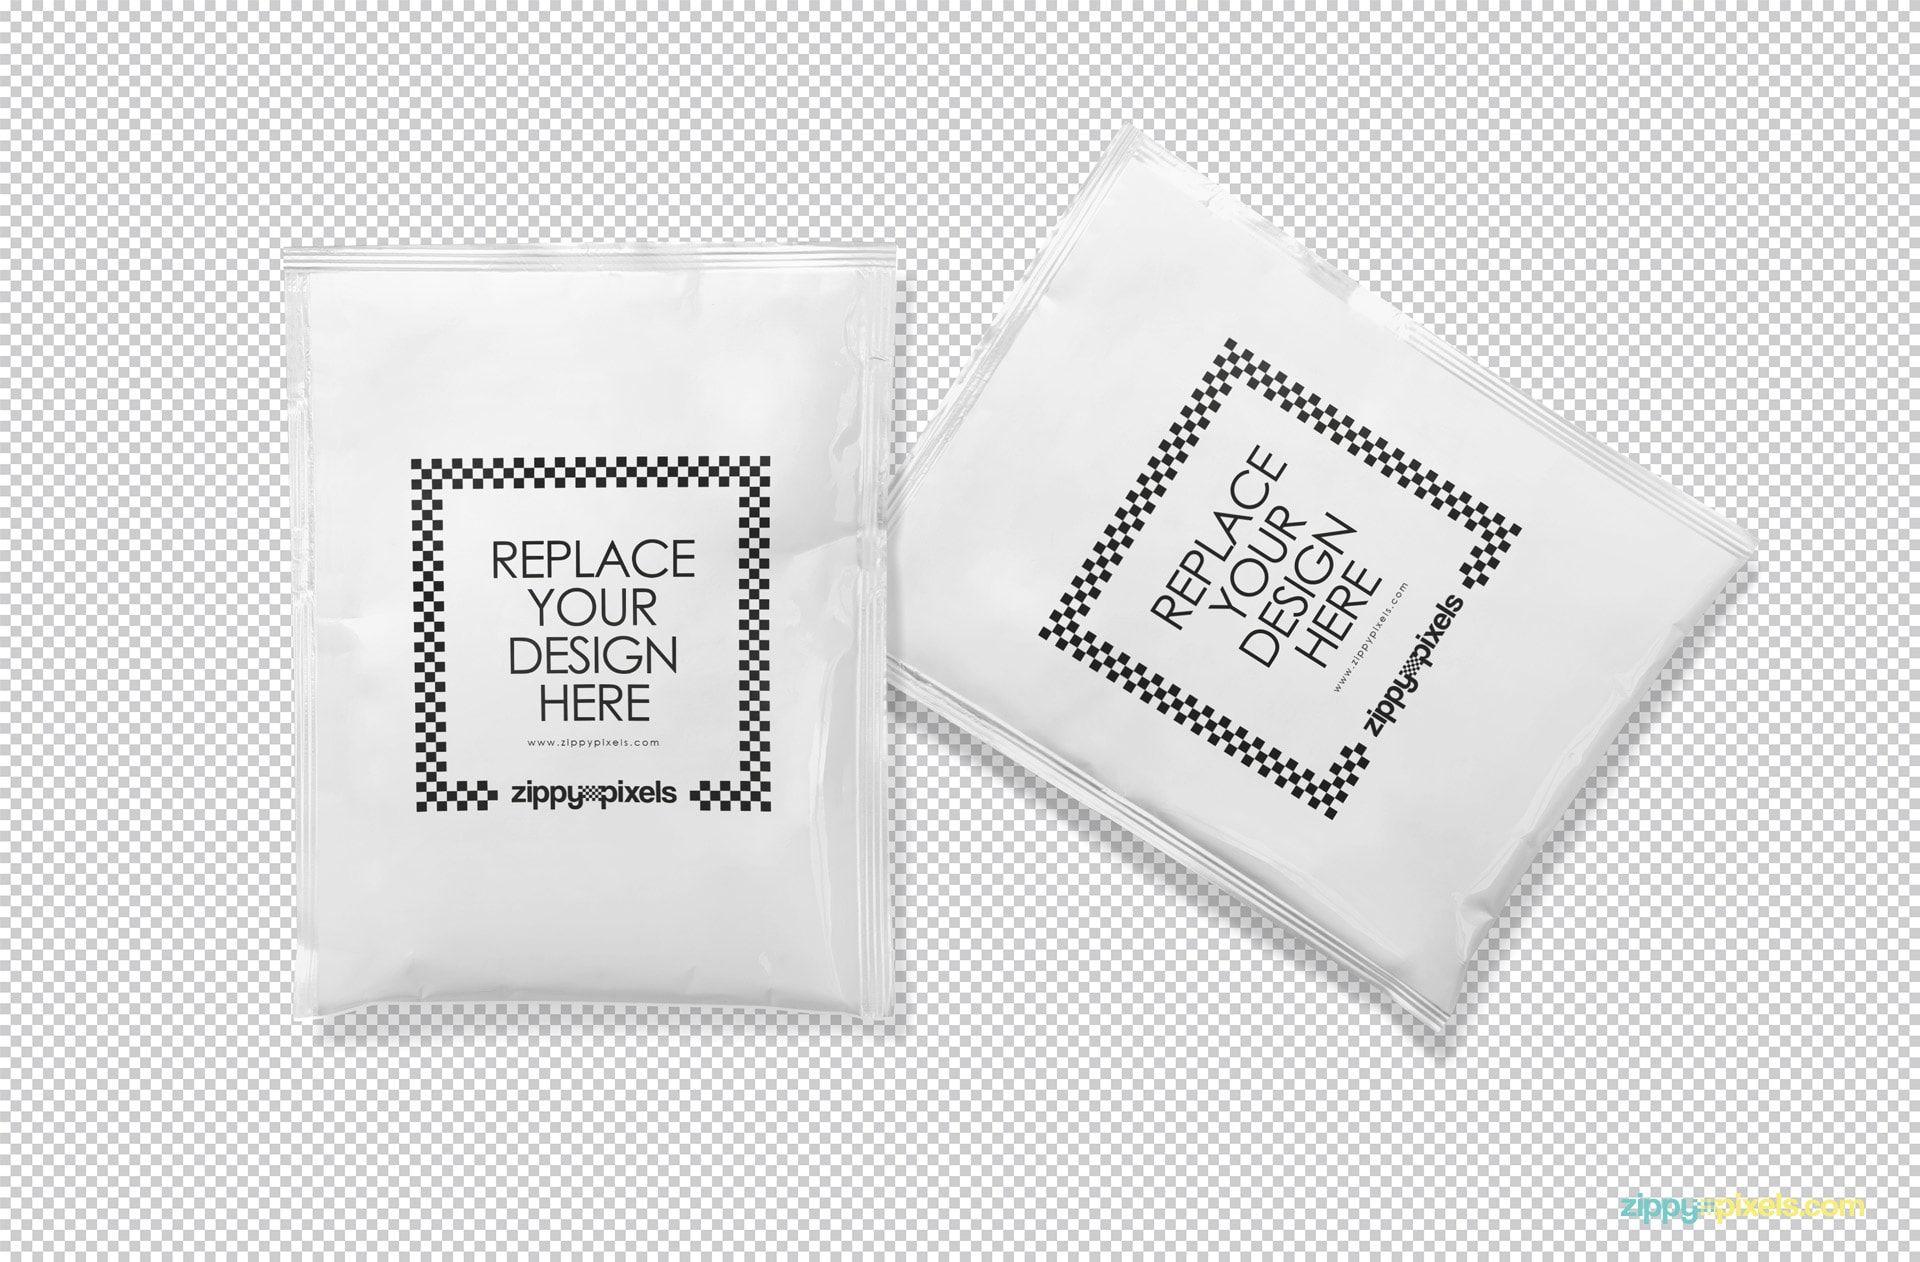 Download Free Foil Sachet Mockup Zippypixels Salon Logo Design Sachet Packaging Mockup